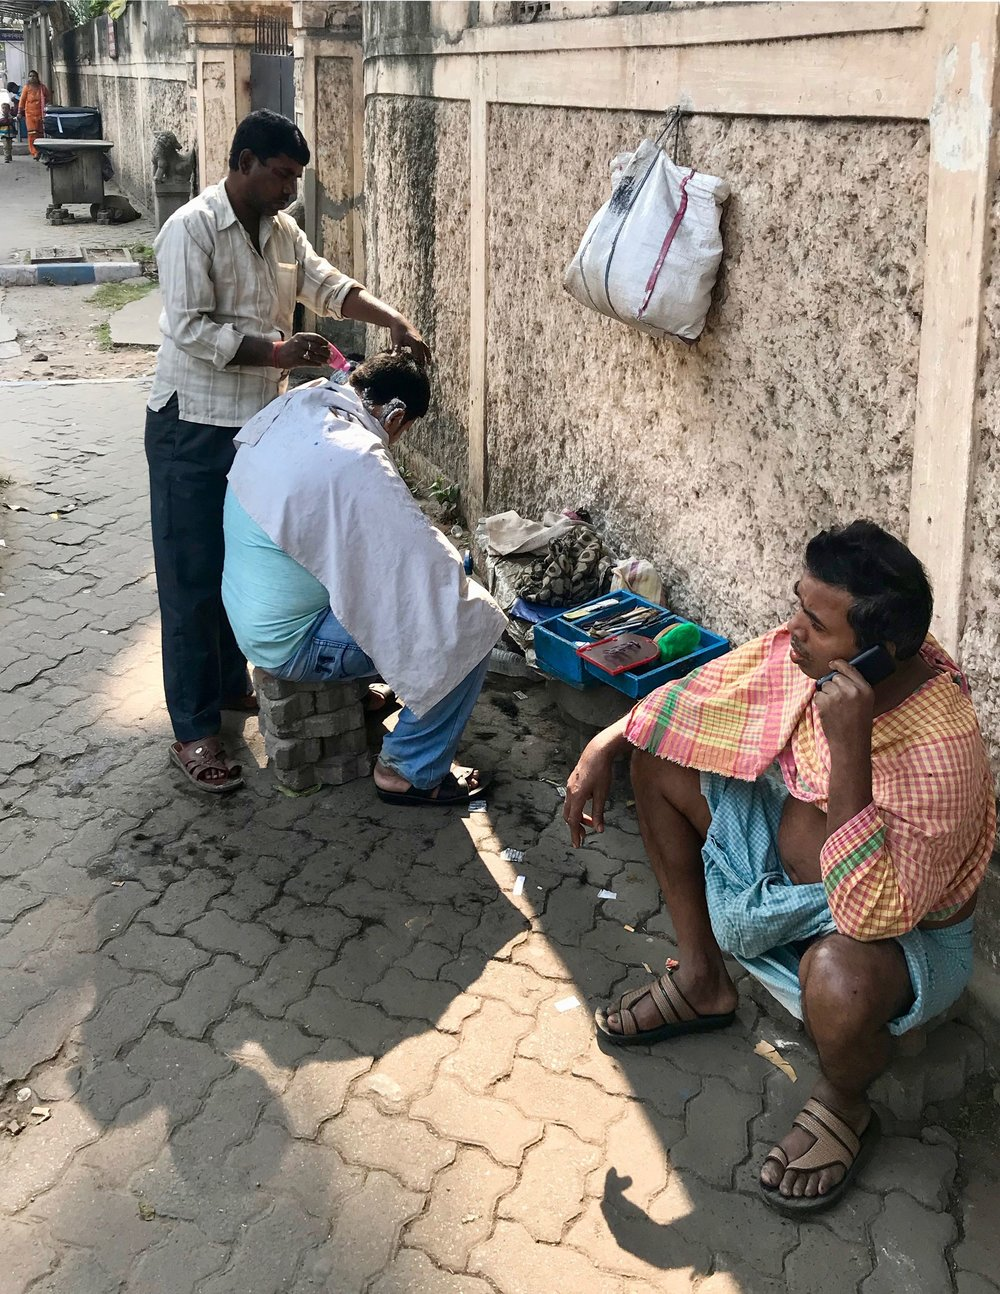 Calcutta (11 au 13 décembre)_13.jpg